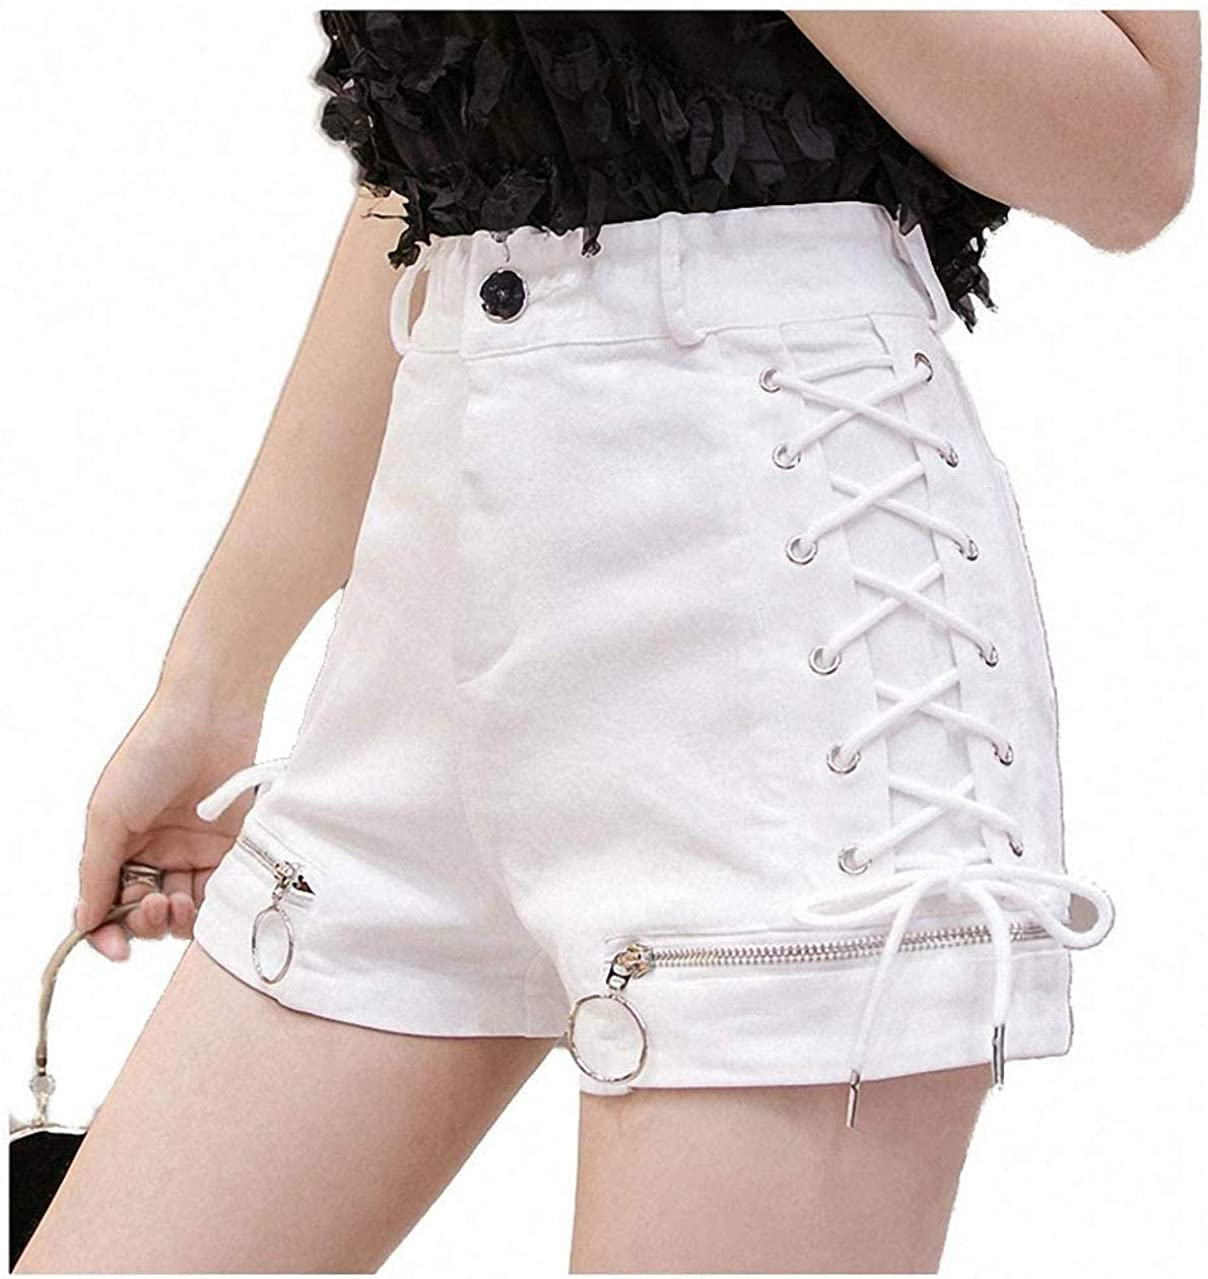 Tayaho Denim Lace Up Shorts Zipper Design High Waist Womens Shorts